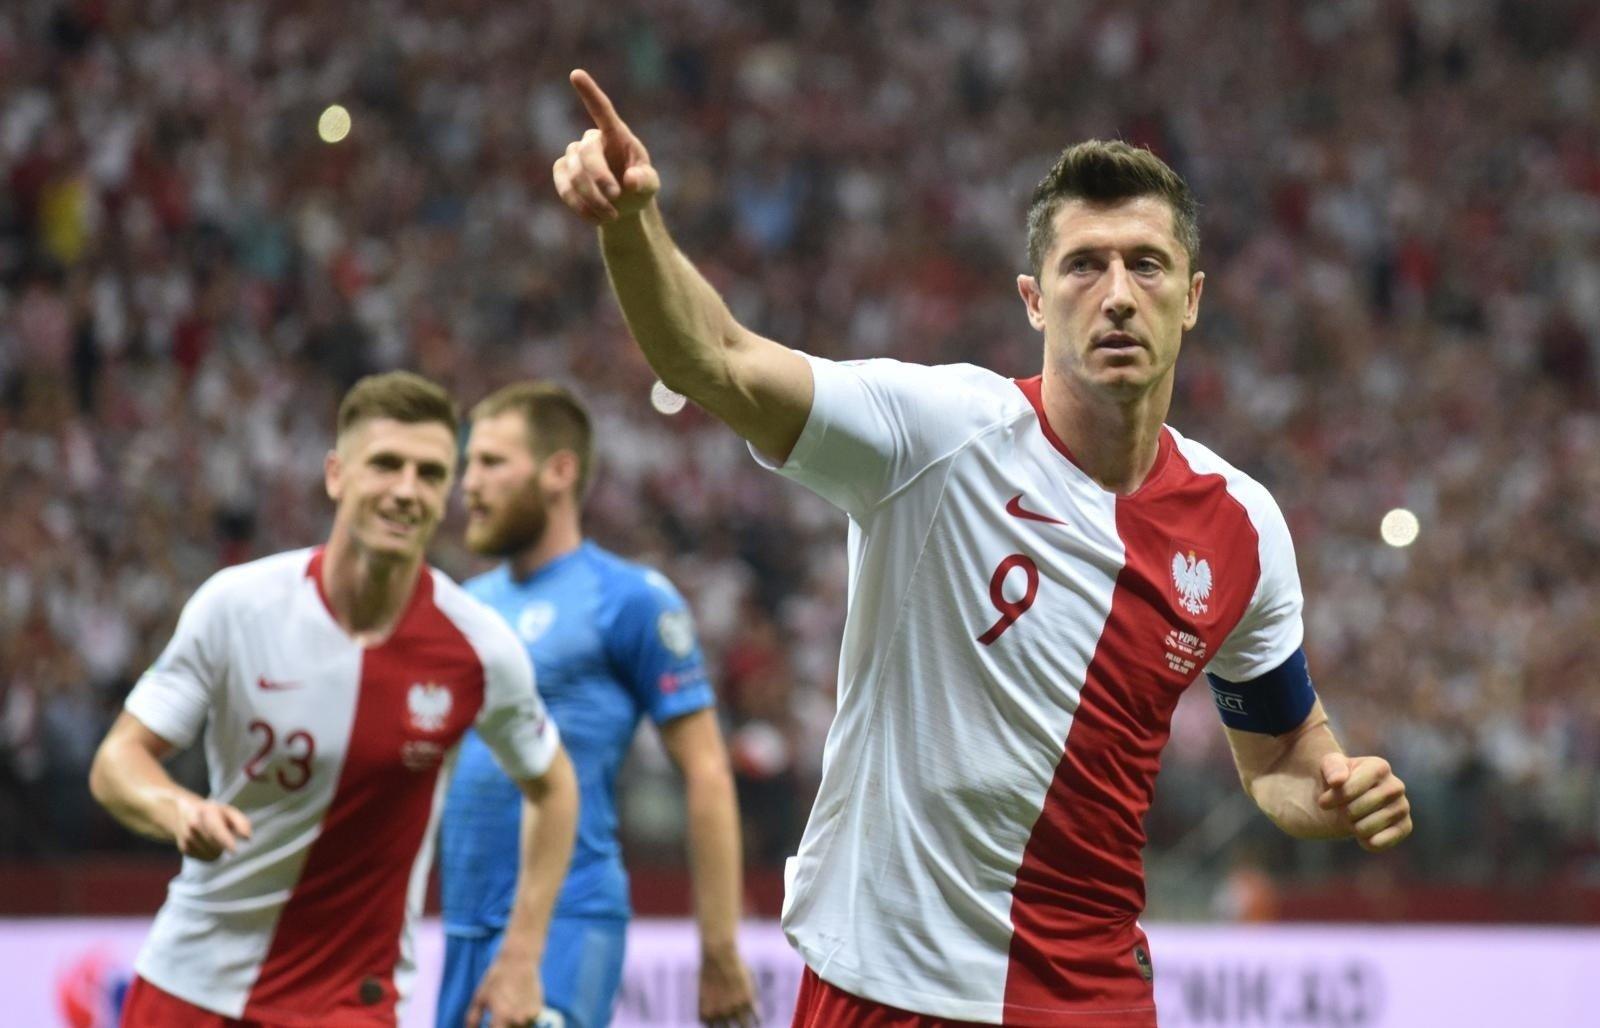 mecz polska izrael online